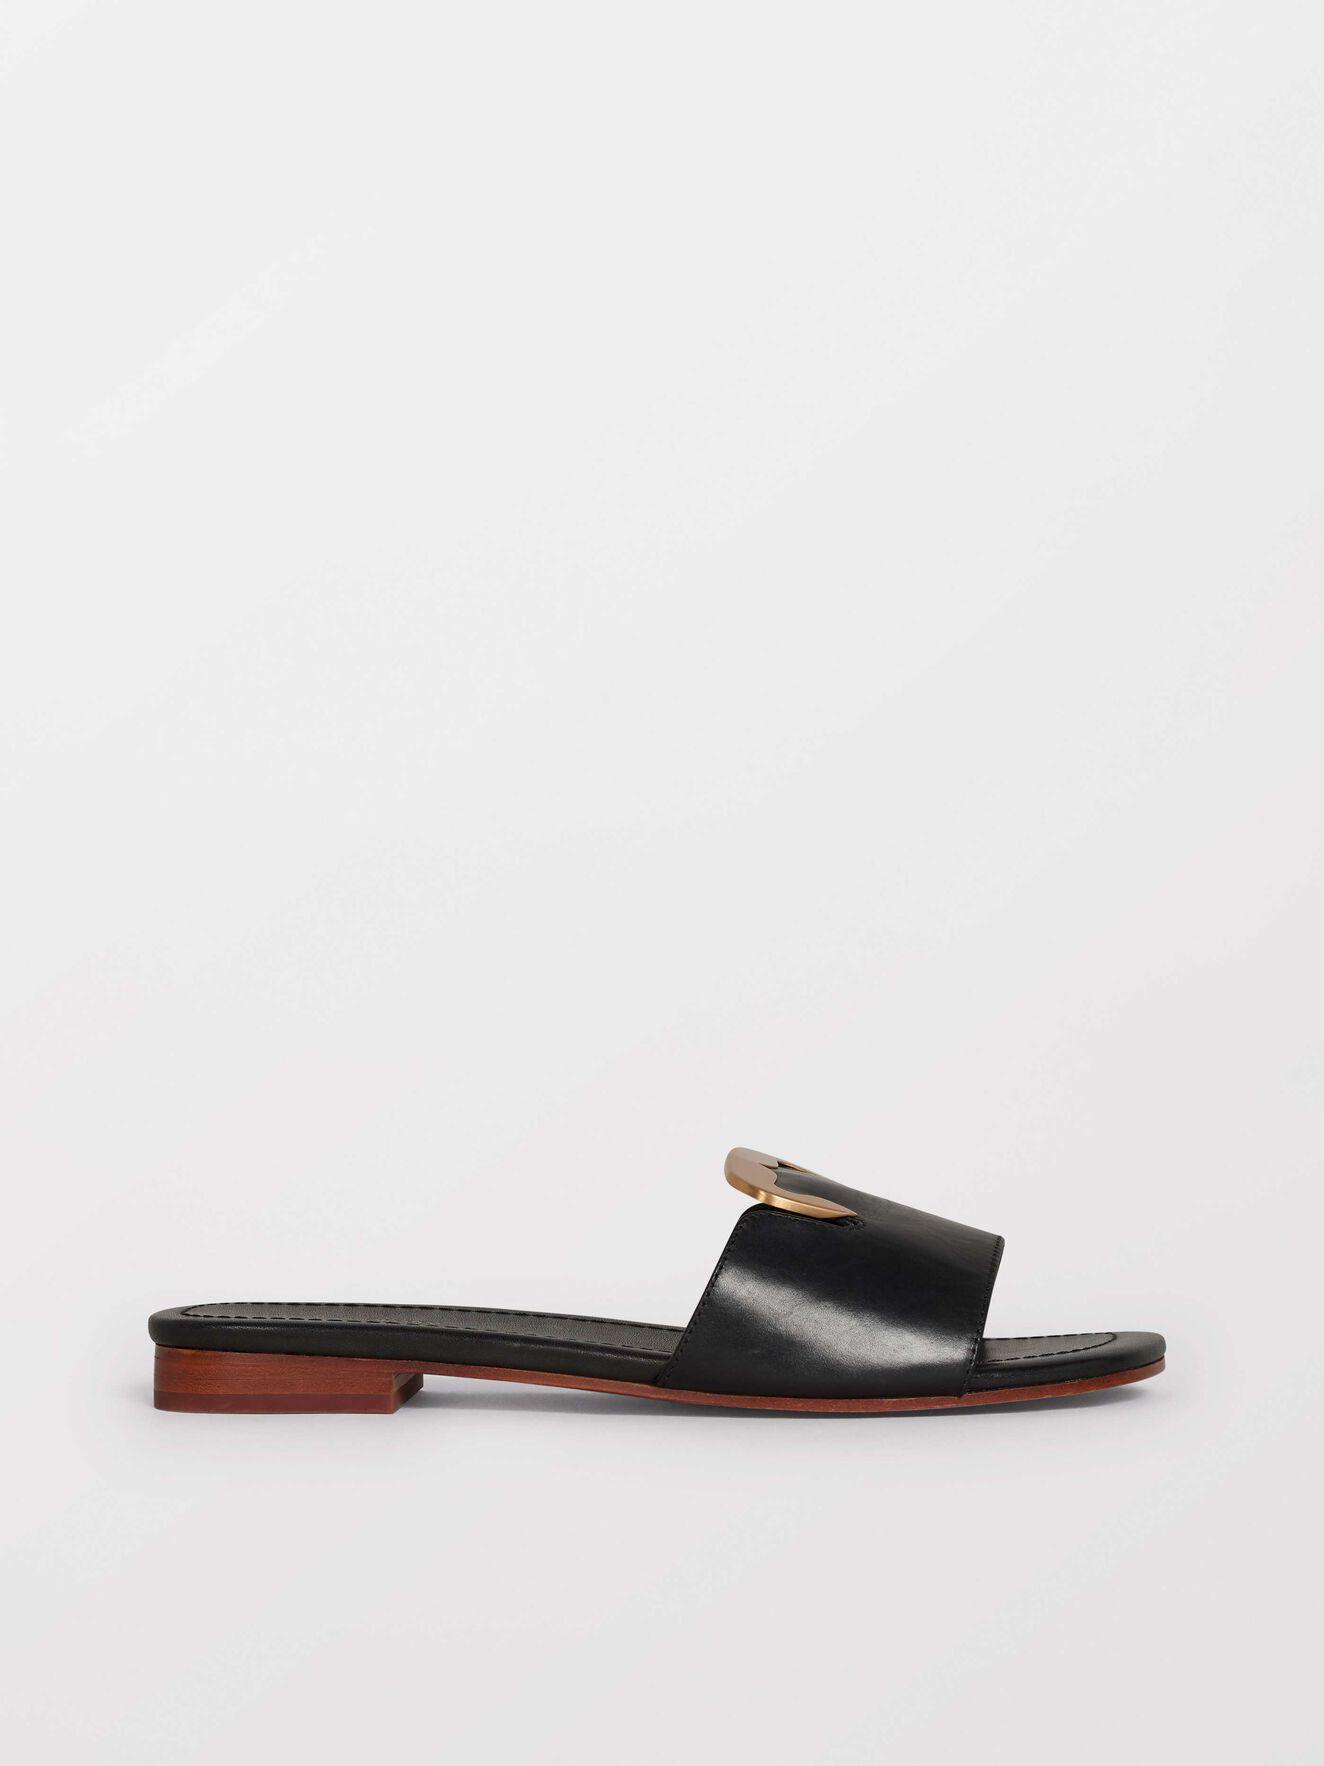 Sisal Sandals in Black from Tiger of Sweden